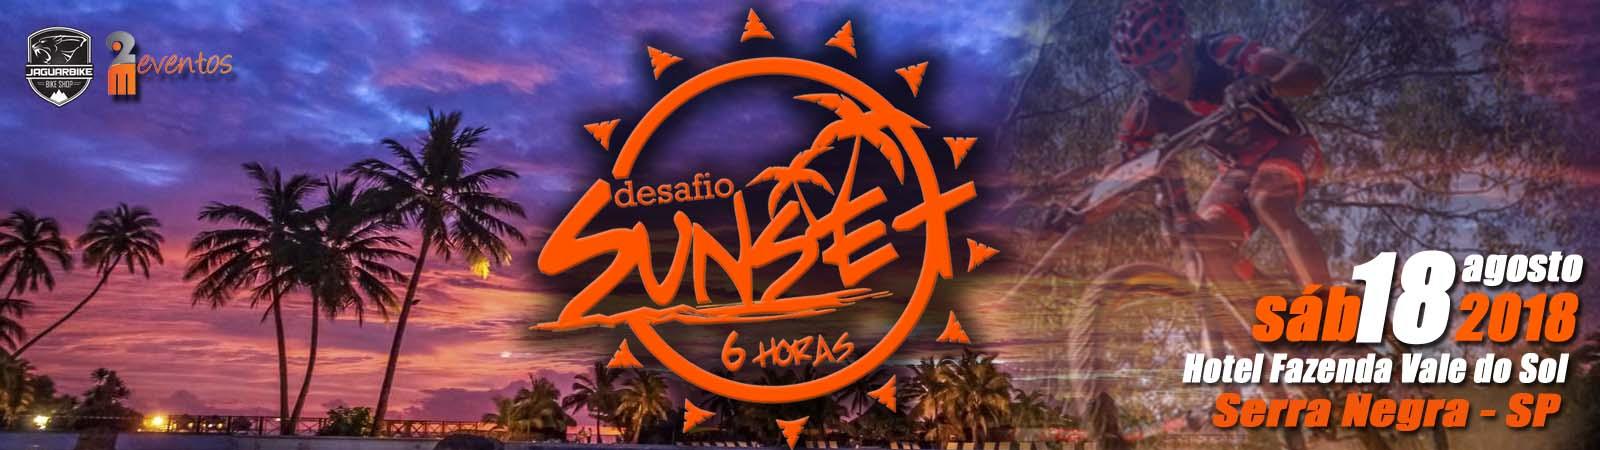 DESAFIO SUNSET 6 HORAS MTB - Imagem de topo